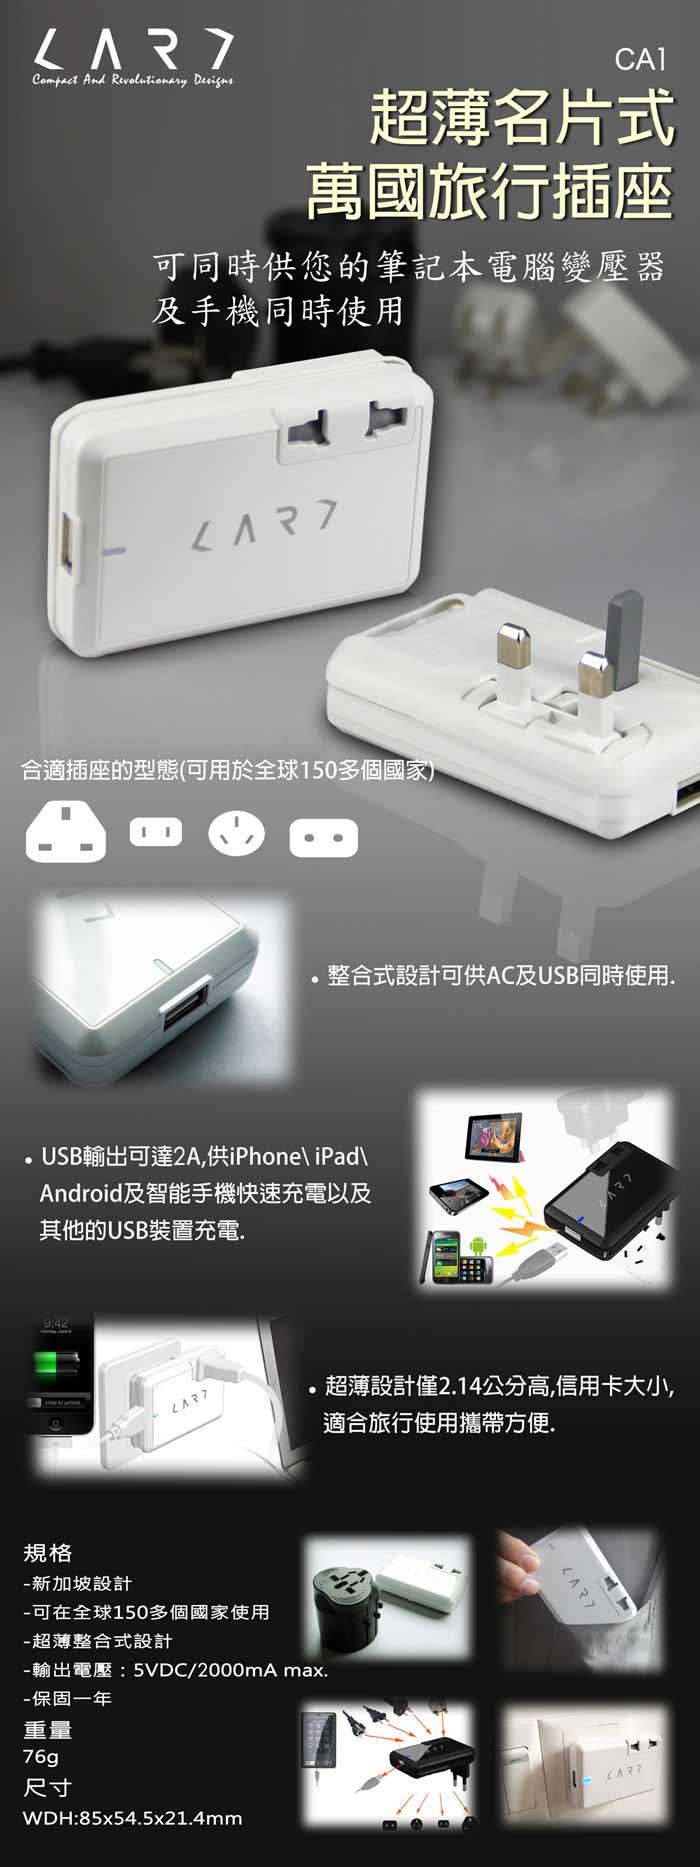 【CARD】CA1 全球旅行萬國插座轉換器